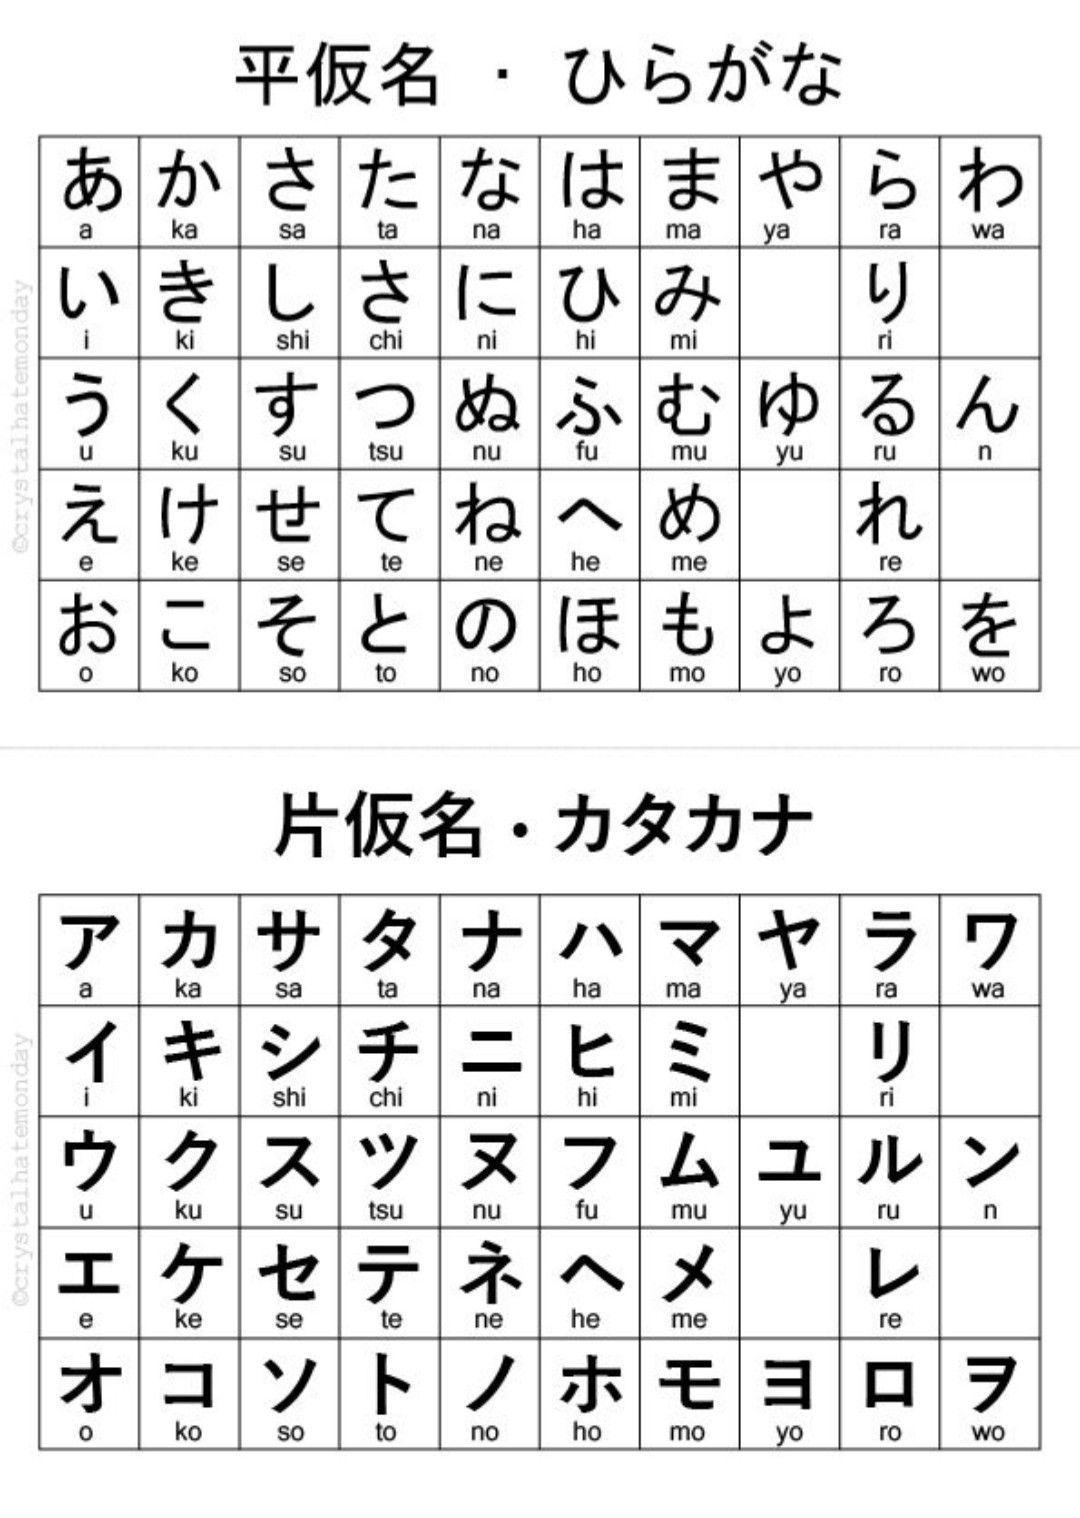 Japanisches Kana Silbensystem Hiragana Und Katakana